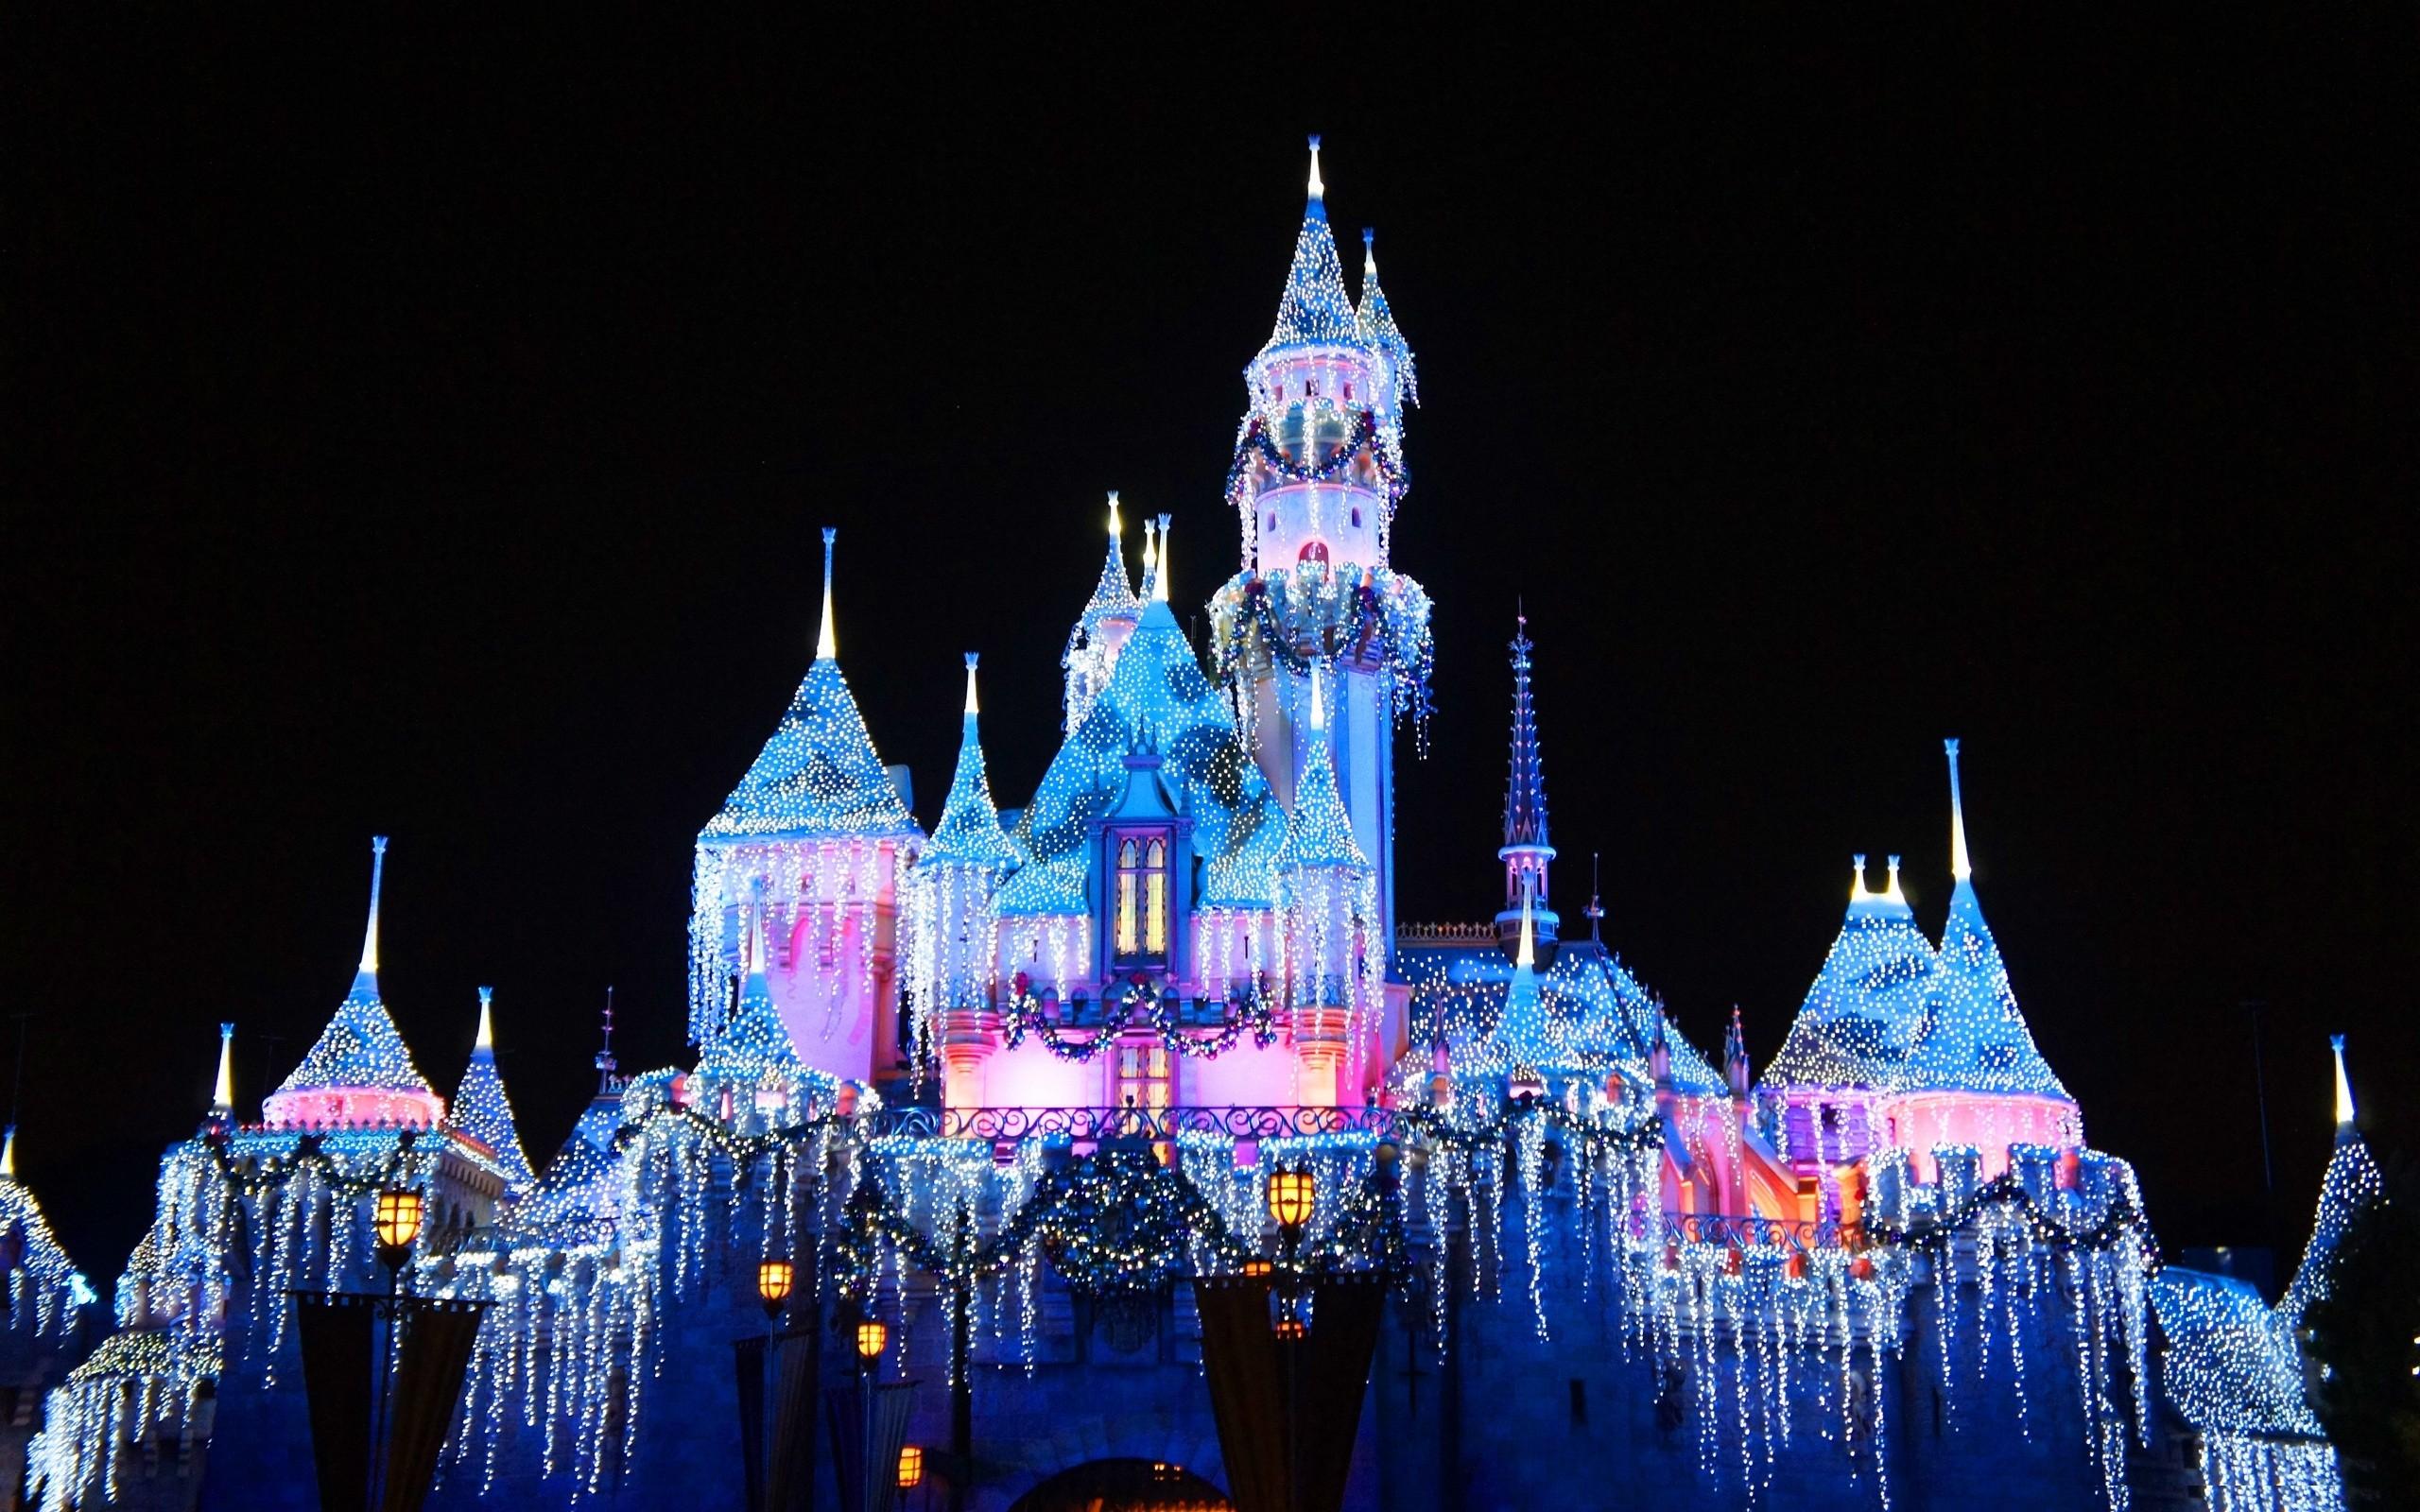 Desktop Wallpapers Disney Castle Pink and Blue Desktop Backgrounds 2560x1600